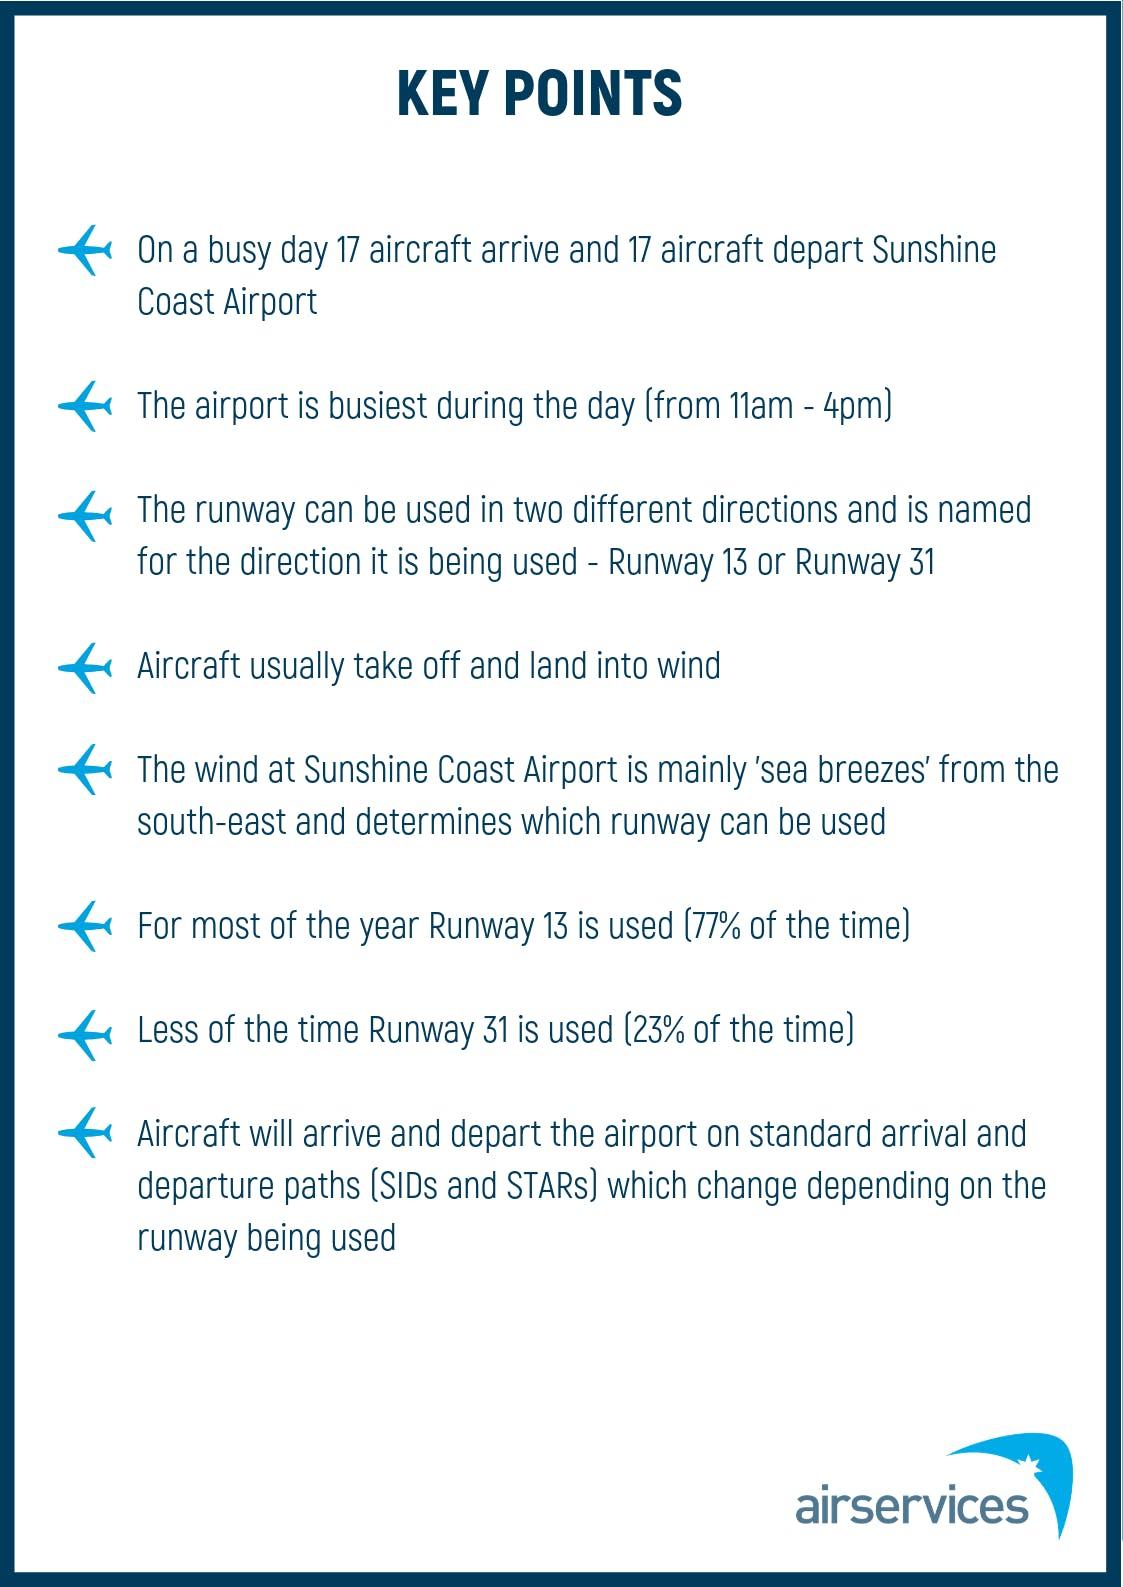 05 Key Overview Poster - Sunshine Coast (July 2019)